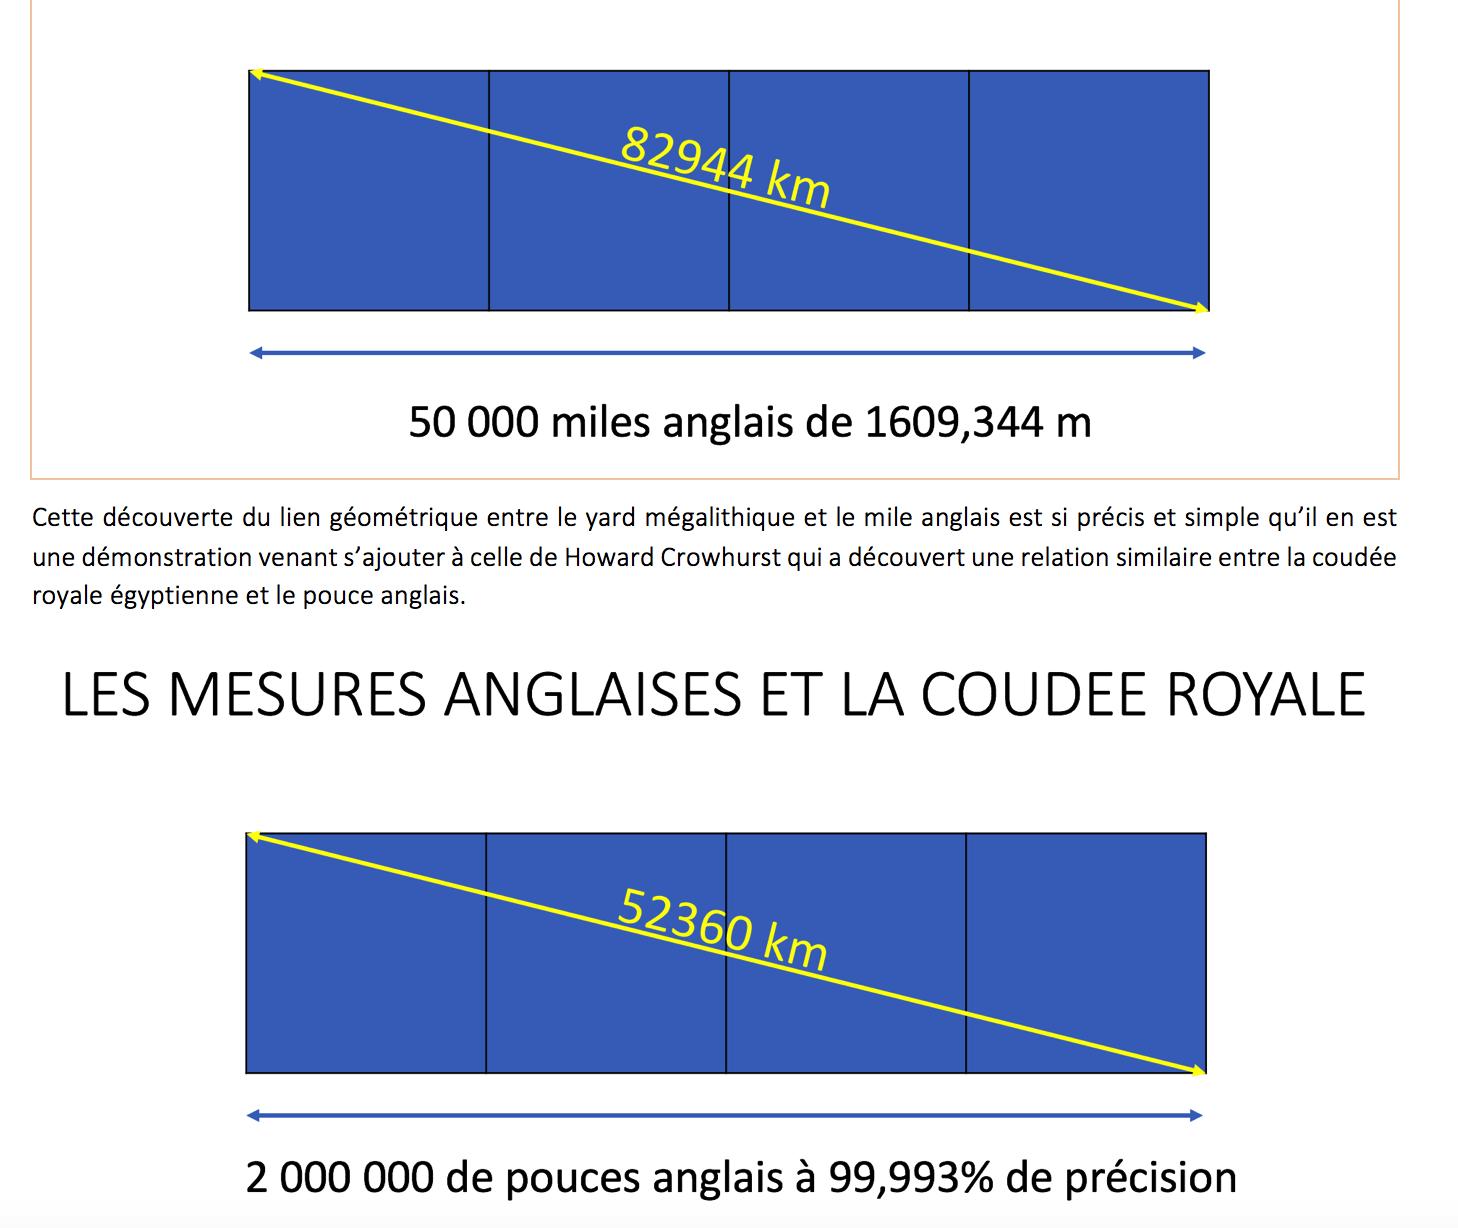 2018-06-10 21:26:59